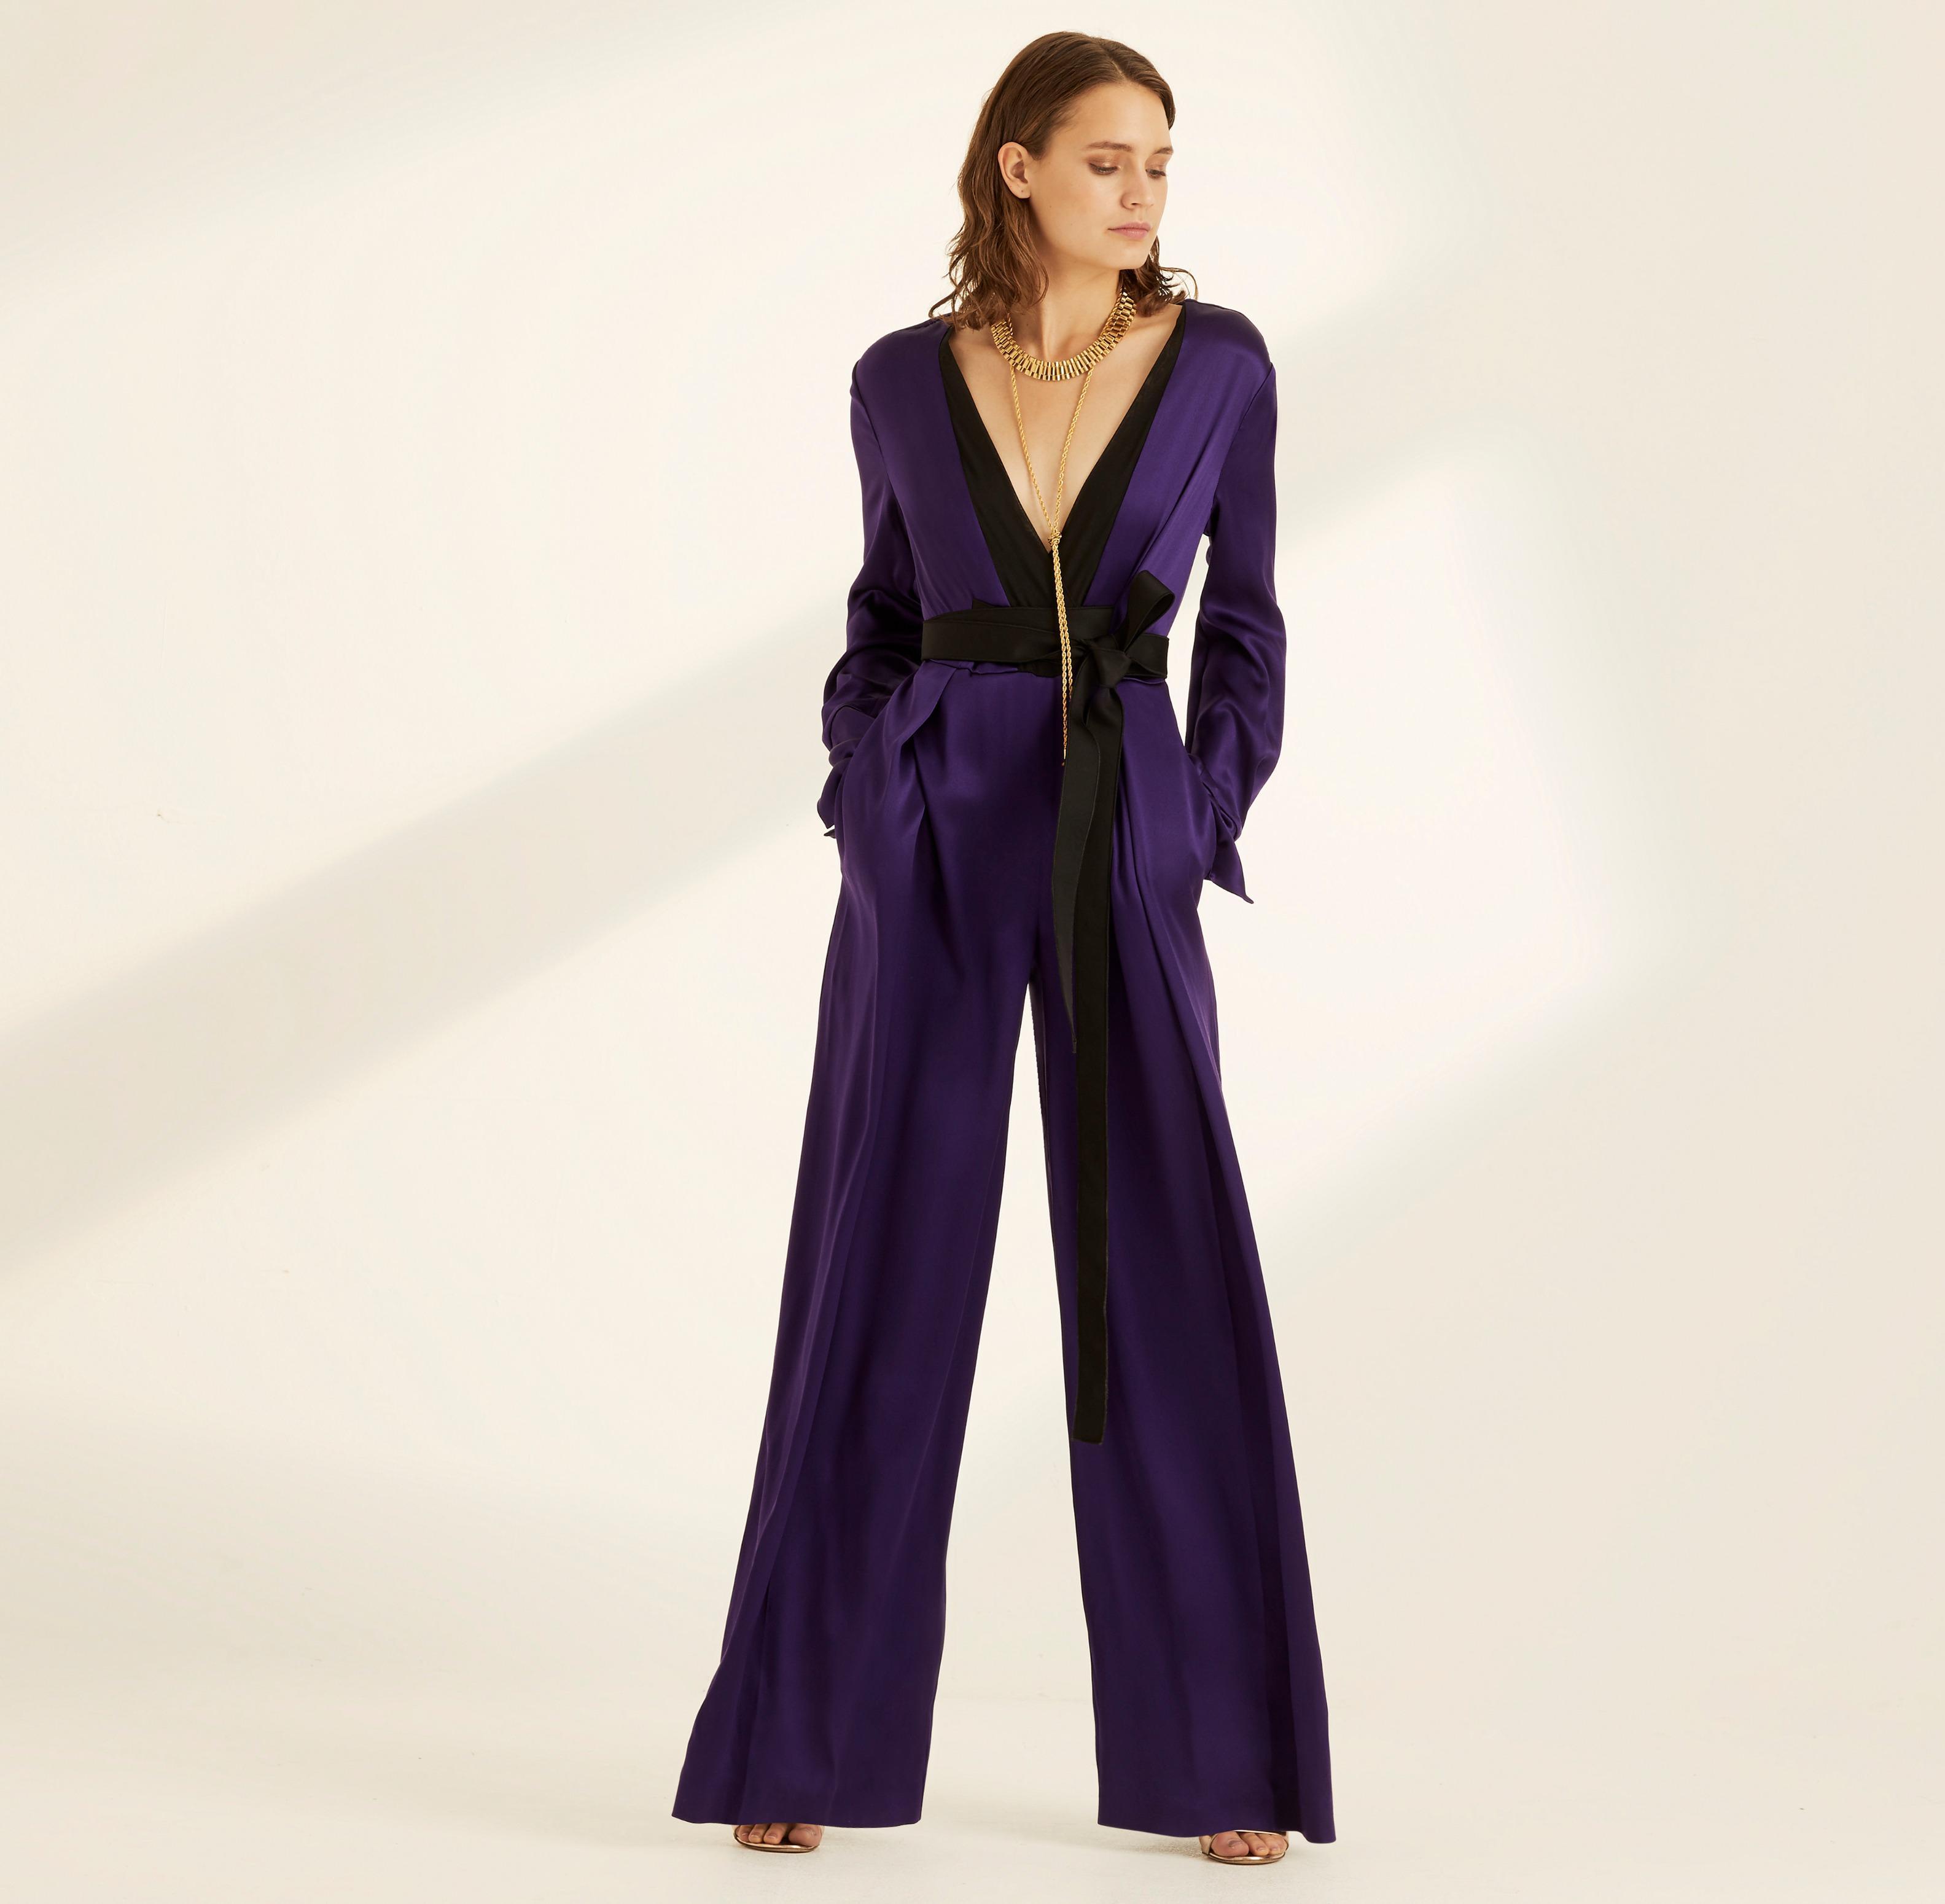 200d1f7c5739 Lyst - Amanda Wakeley Violet Crepe Back Satin Jumpsuit in Purple